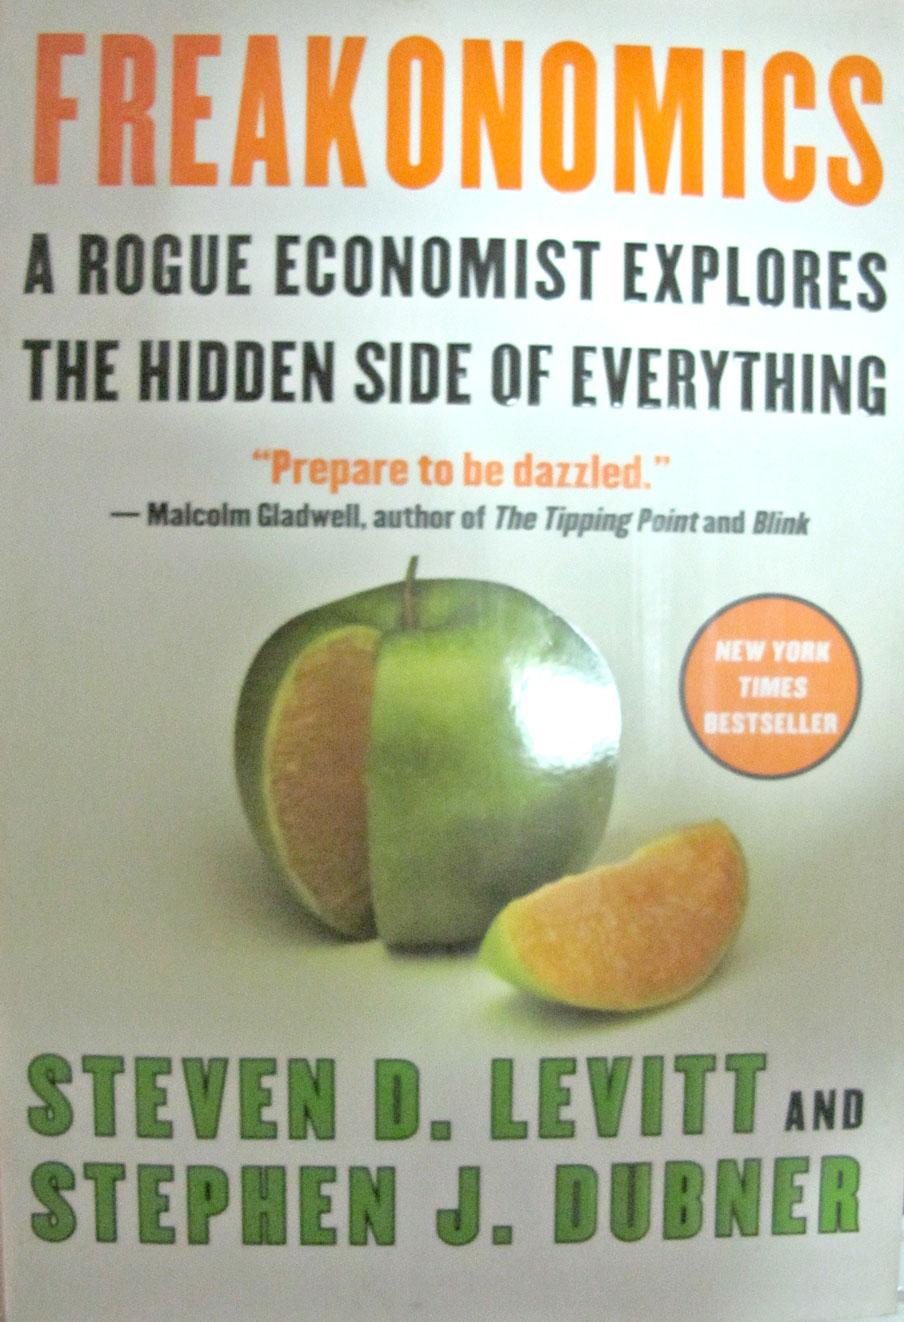 freakonomics rogue economist explores hidden side Required reading: freakonomics : a rogue economist explores the hidden  side of everything cj kirk required reading 2 months ago.